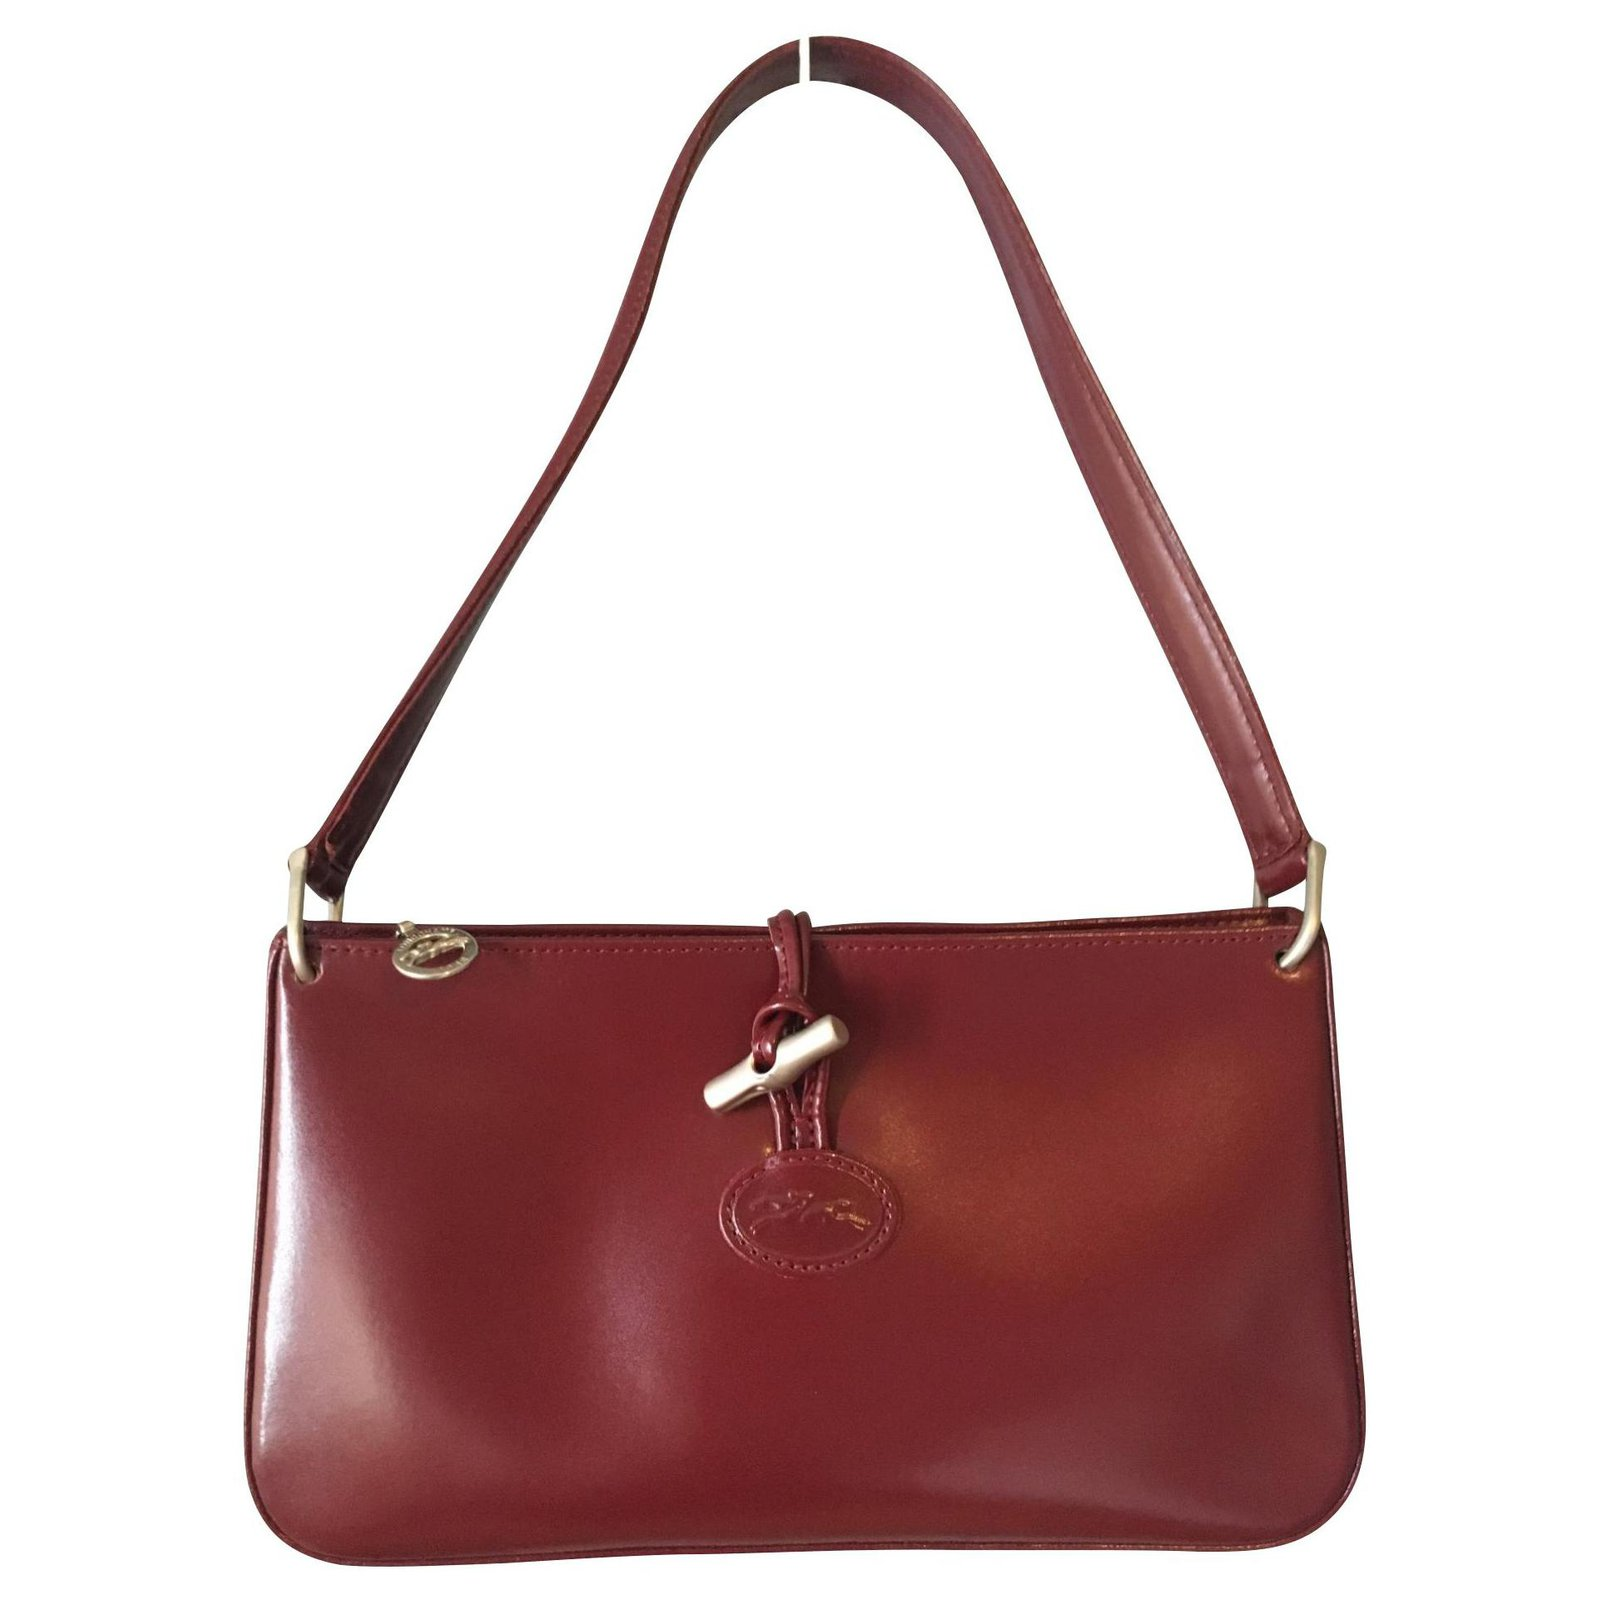 Vintage Longchamp bag, Fuseau model, cowhide leather in dark fuchsia /  burgundy tones